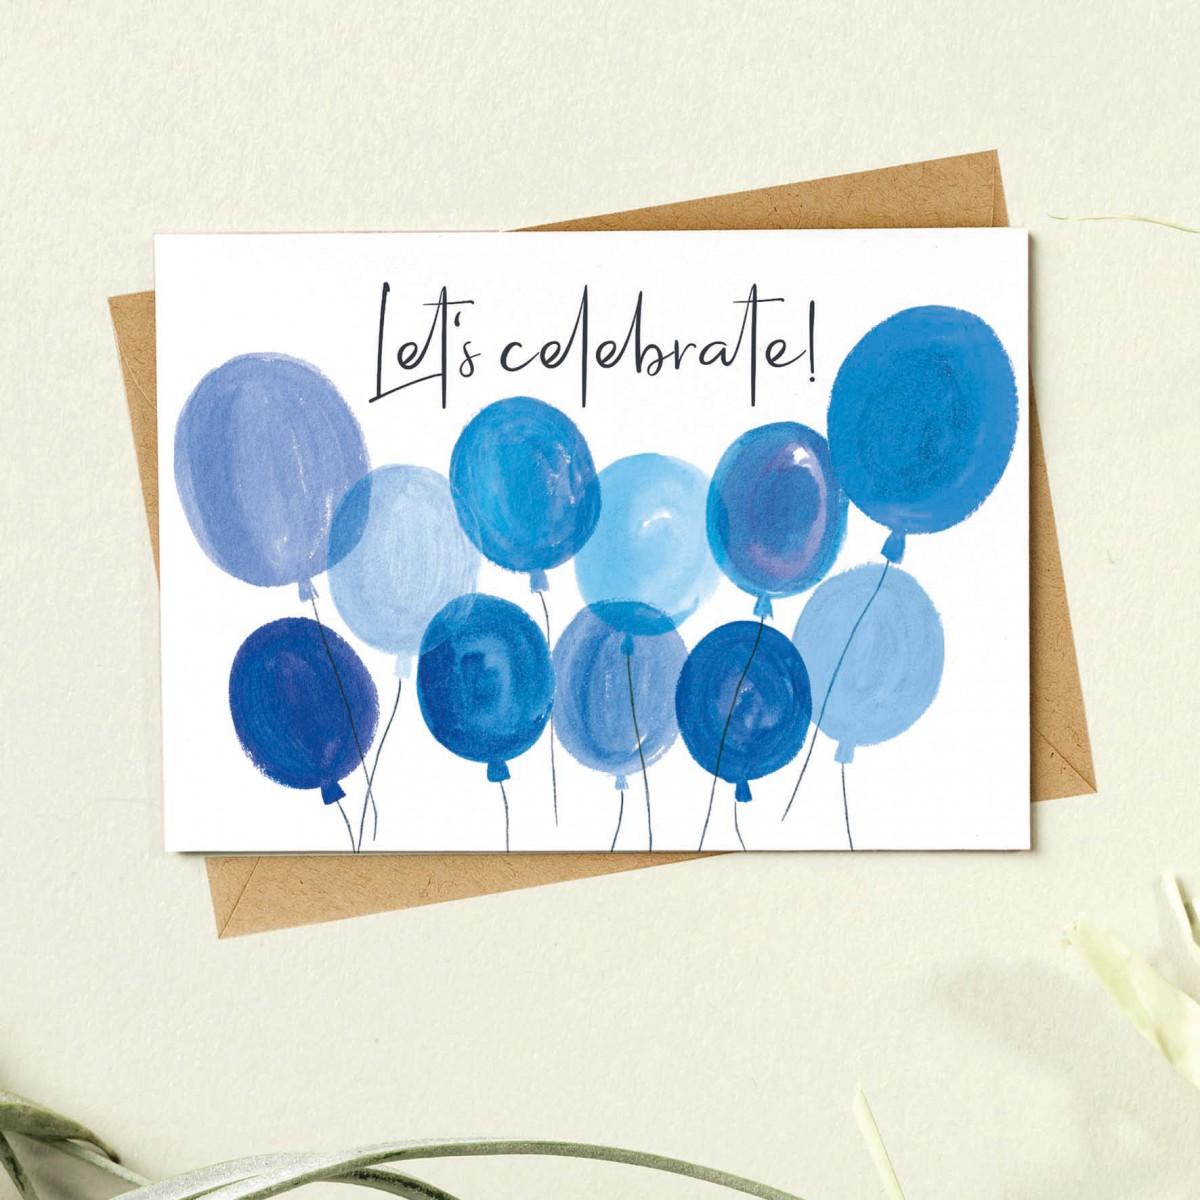 Paperlandscape   Faltkarte   Luftballons   Let's celebrate   Geburtstagskarte